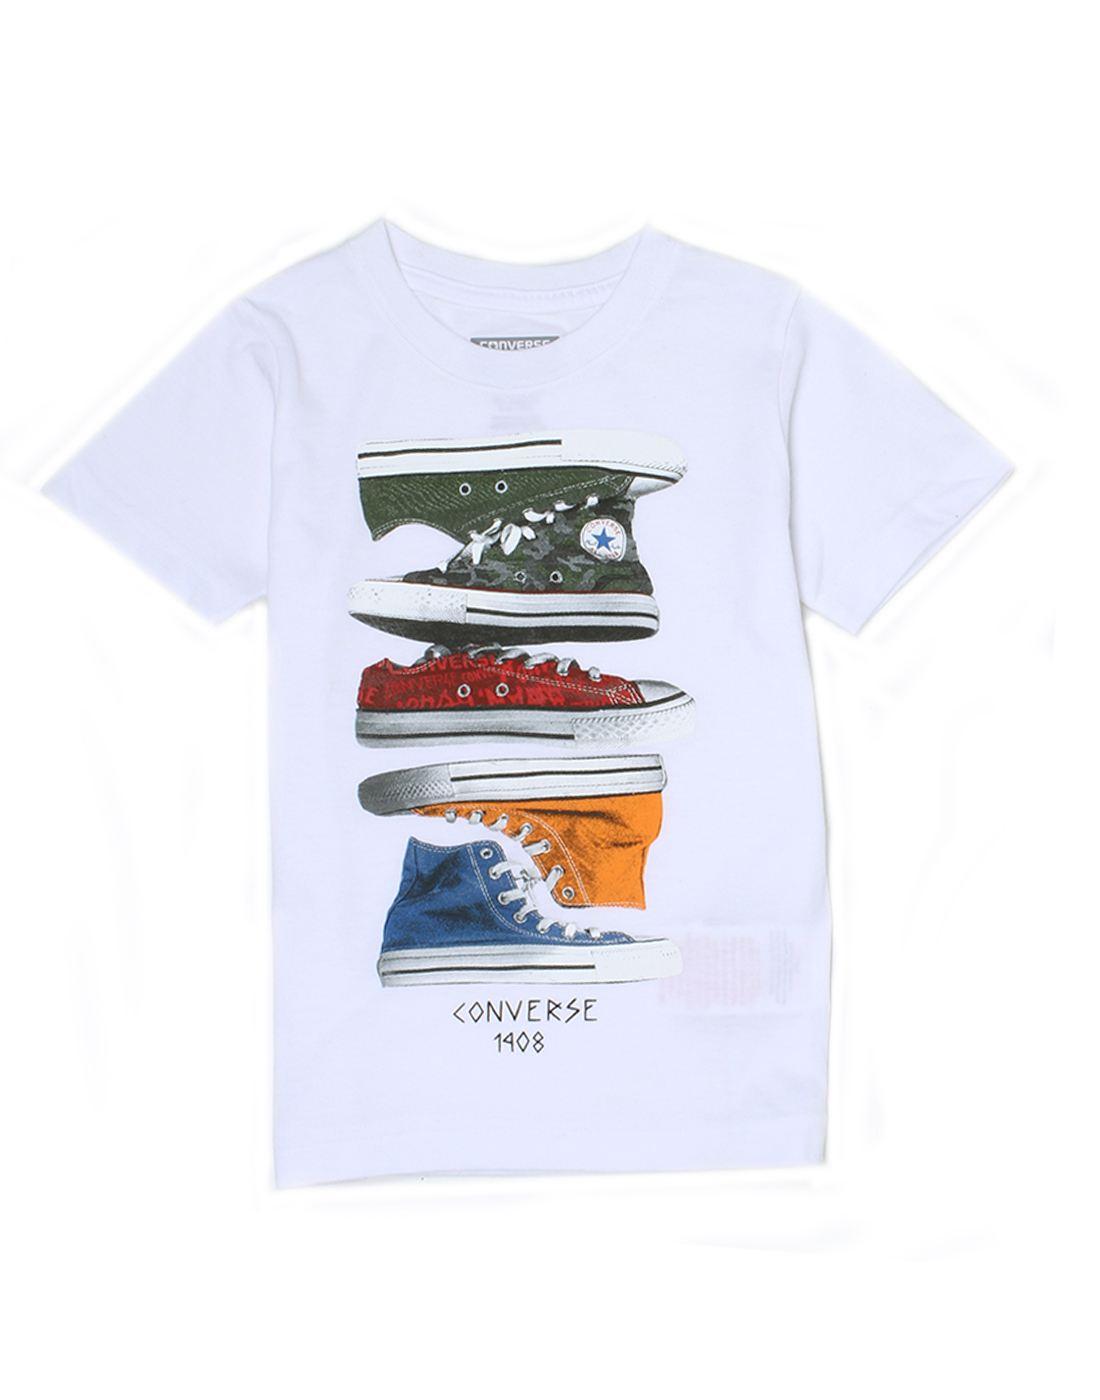 Converse Boys White T-Shirt